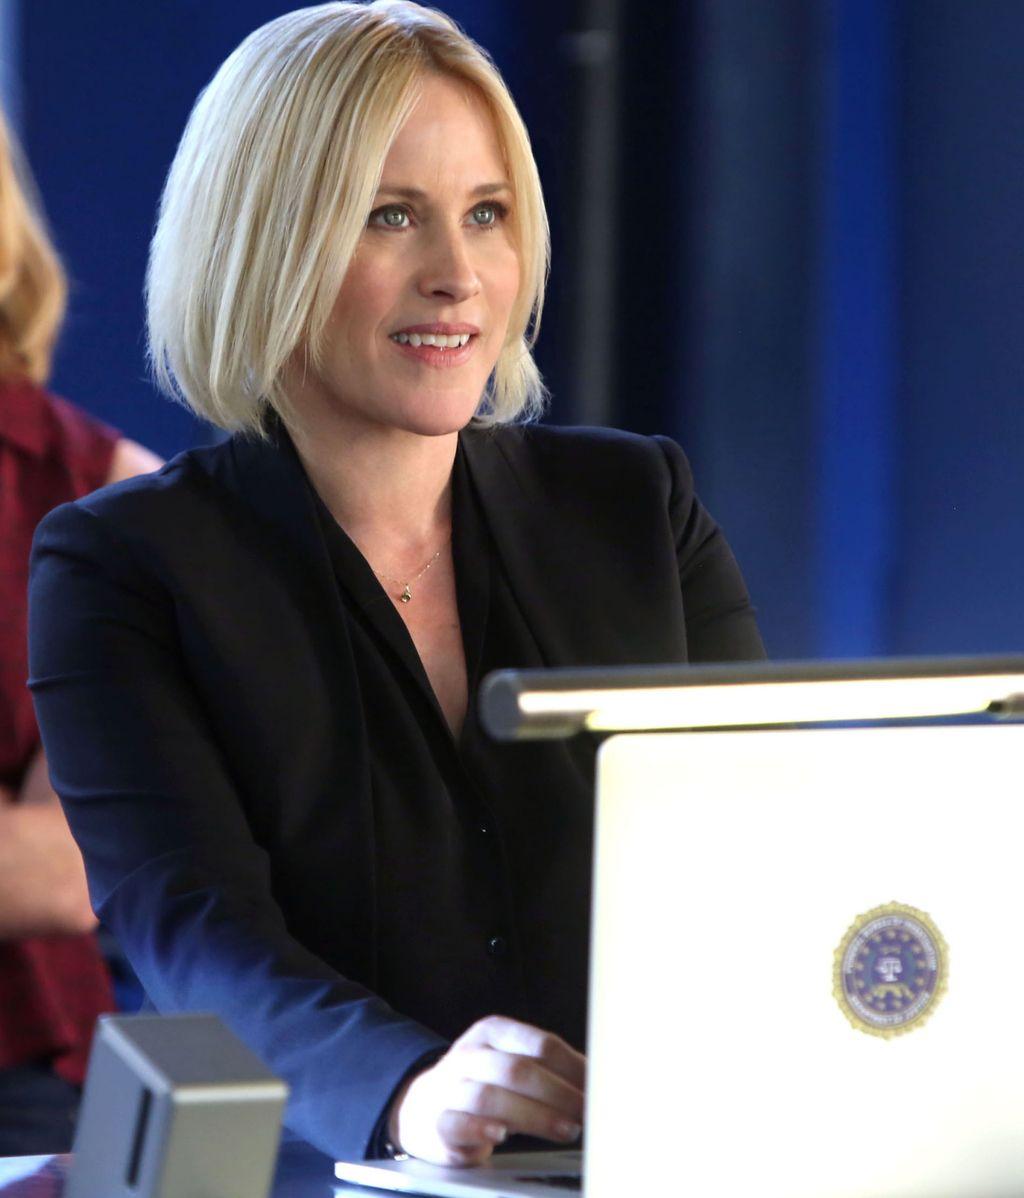 Patricia Arquette en CSI